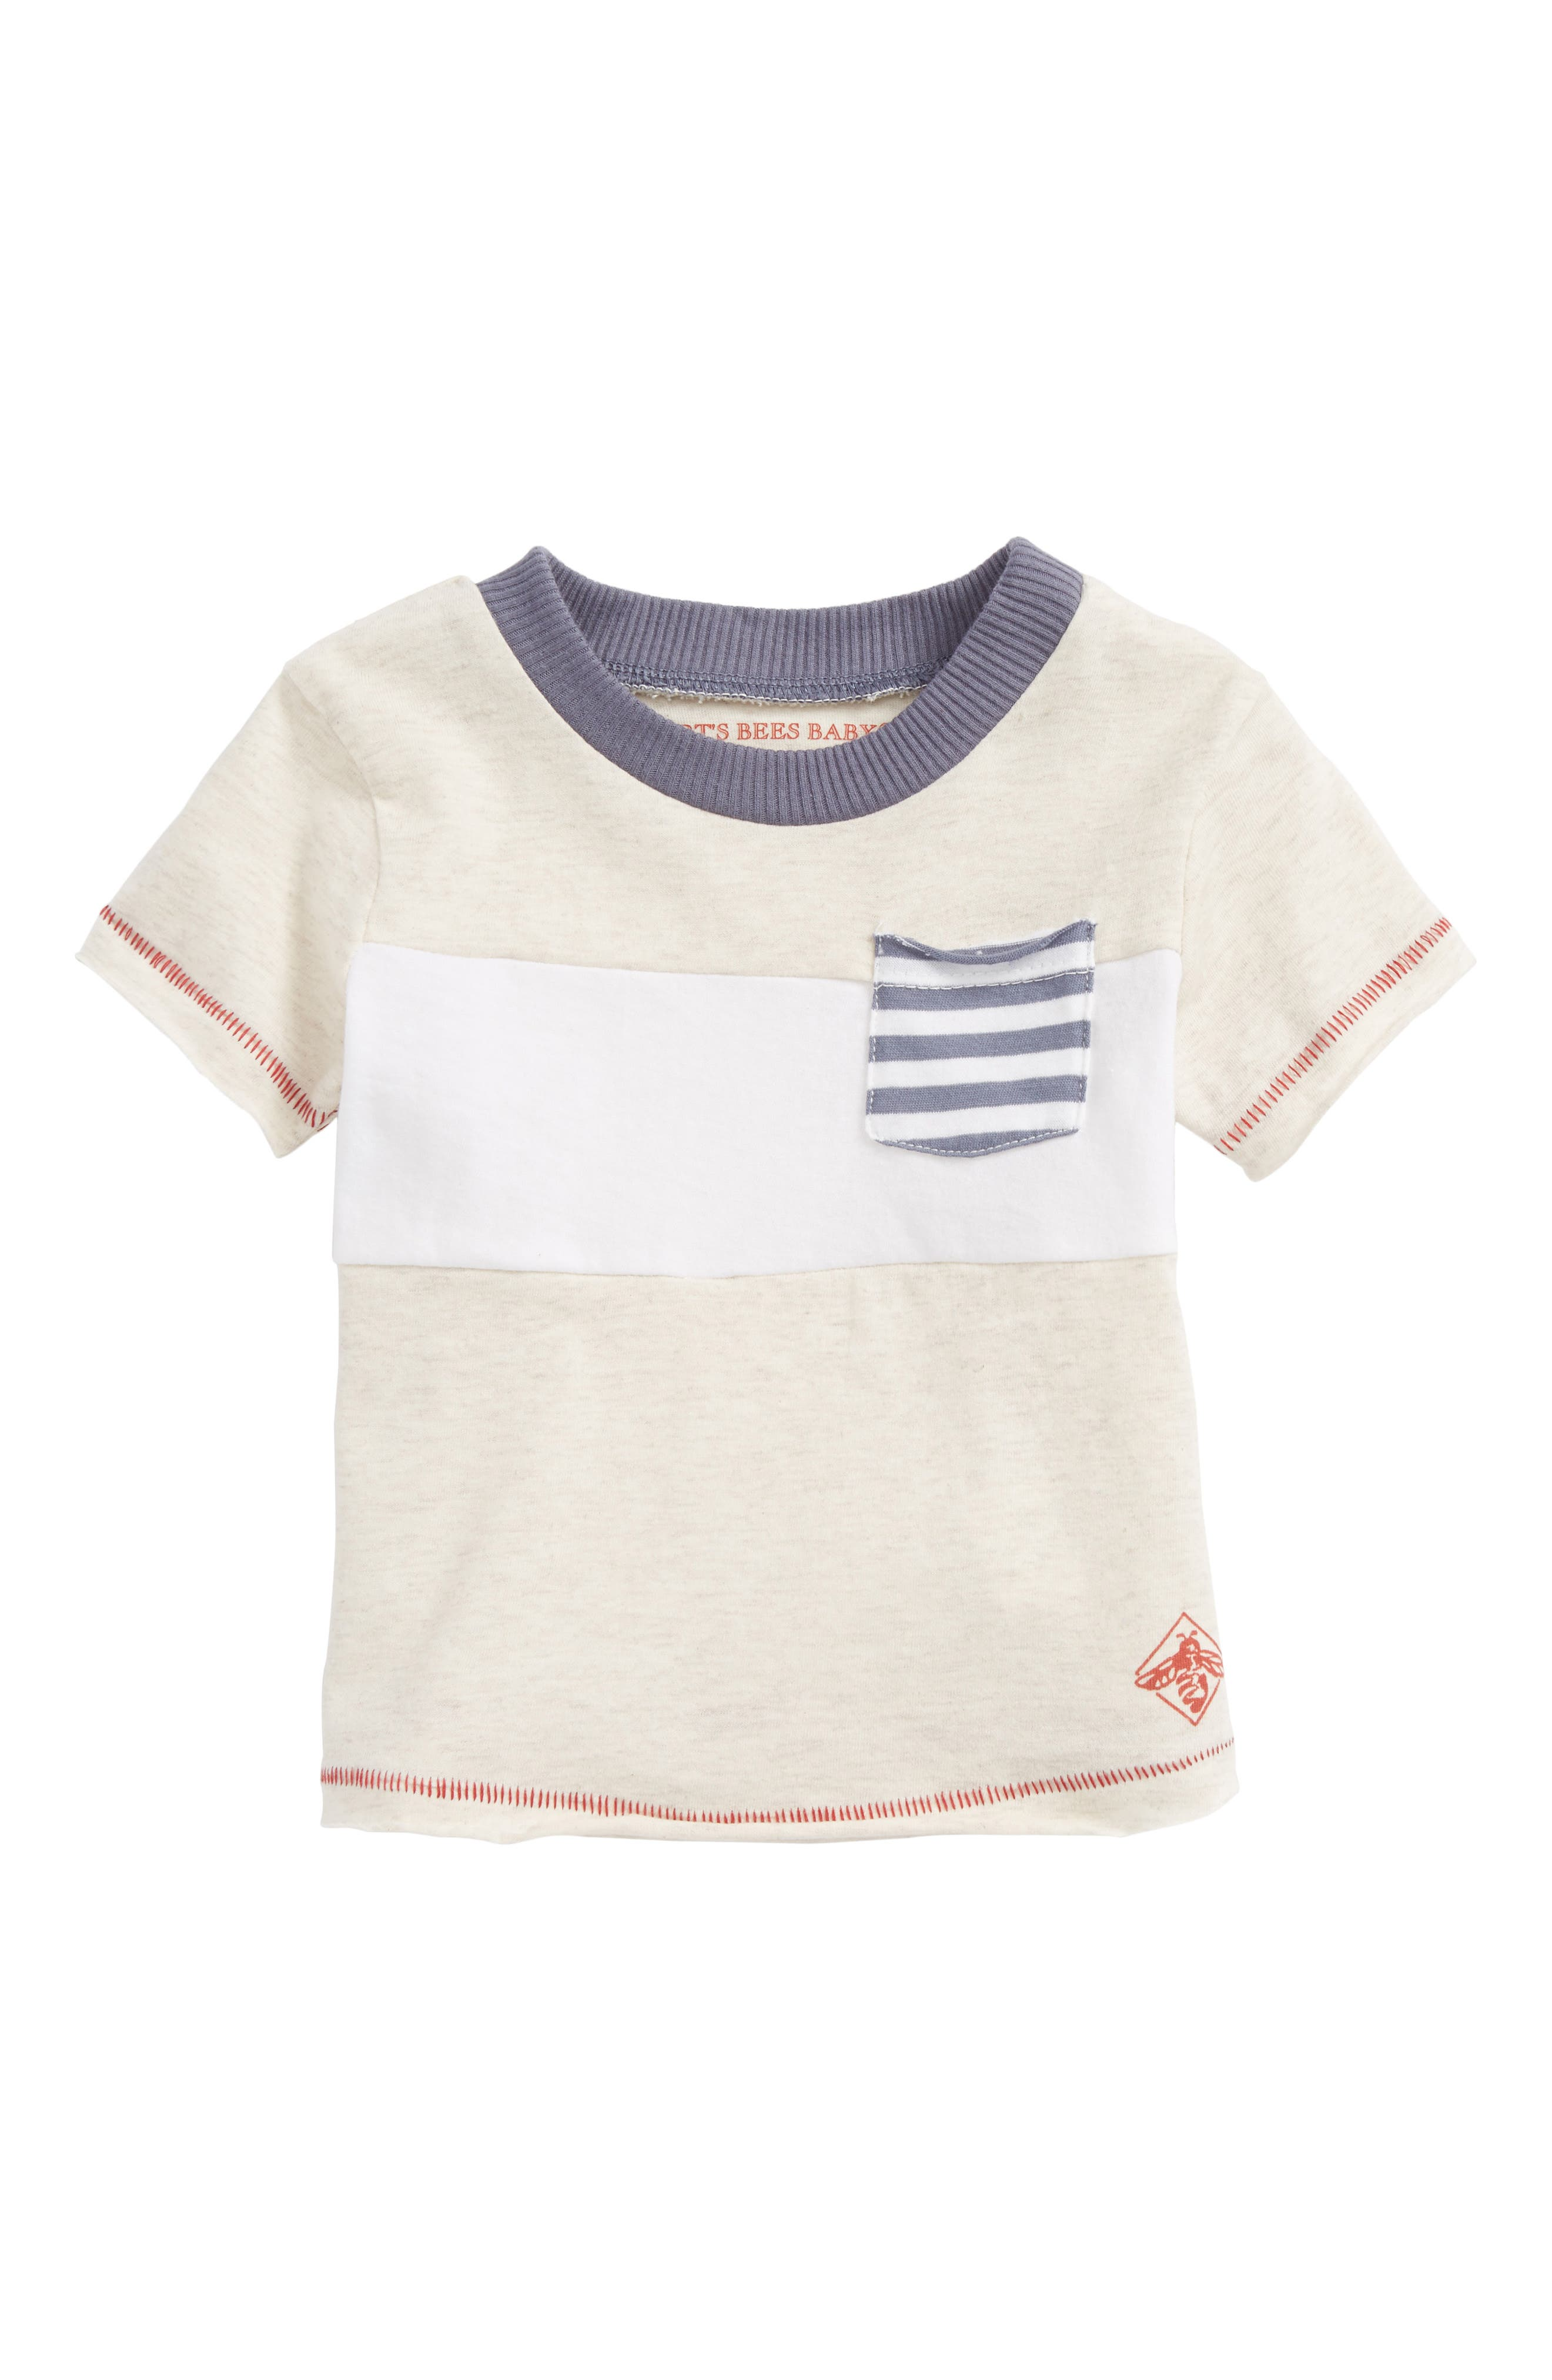 Main Image - Burt's Bees Baby Organic Cotton Pocket T-Shirt (Baby Boys)